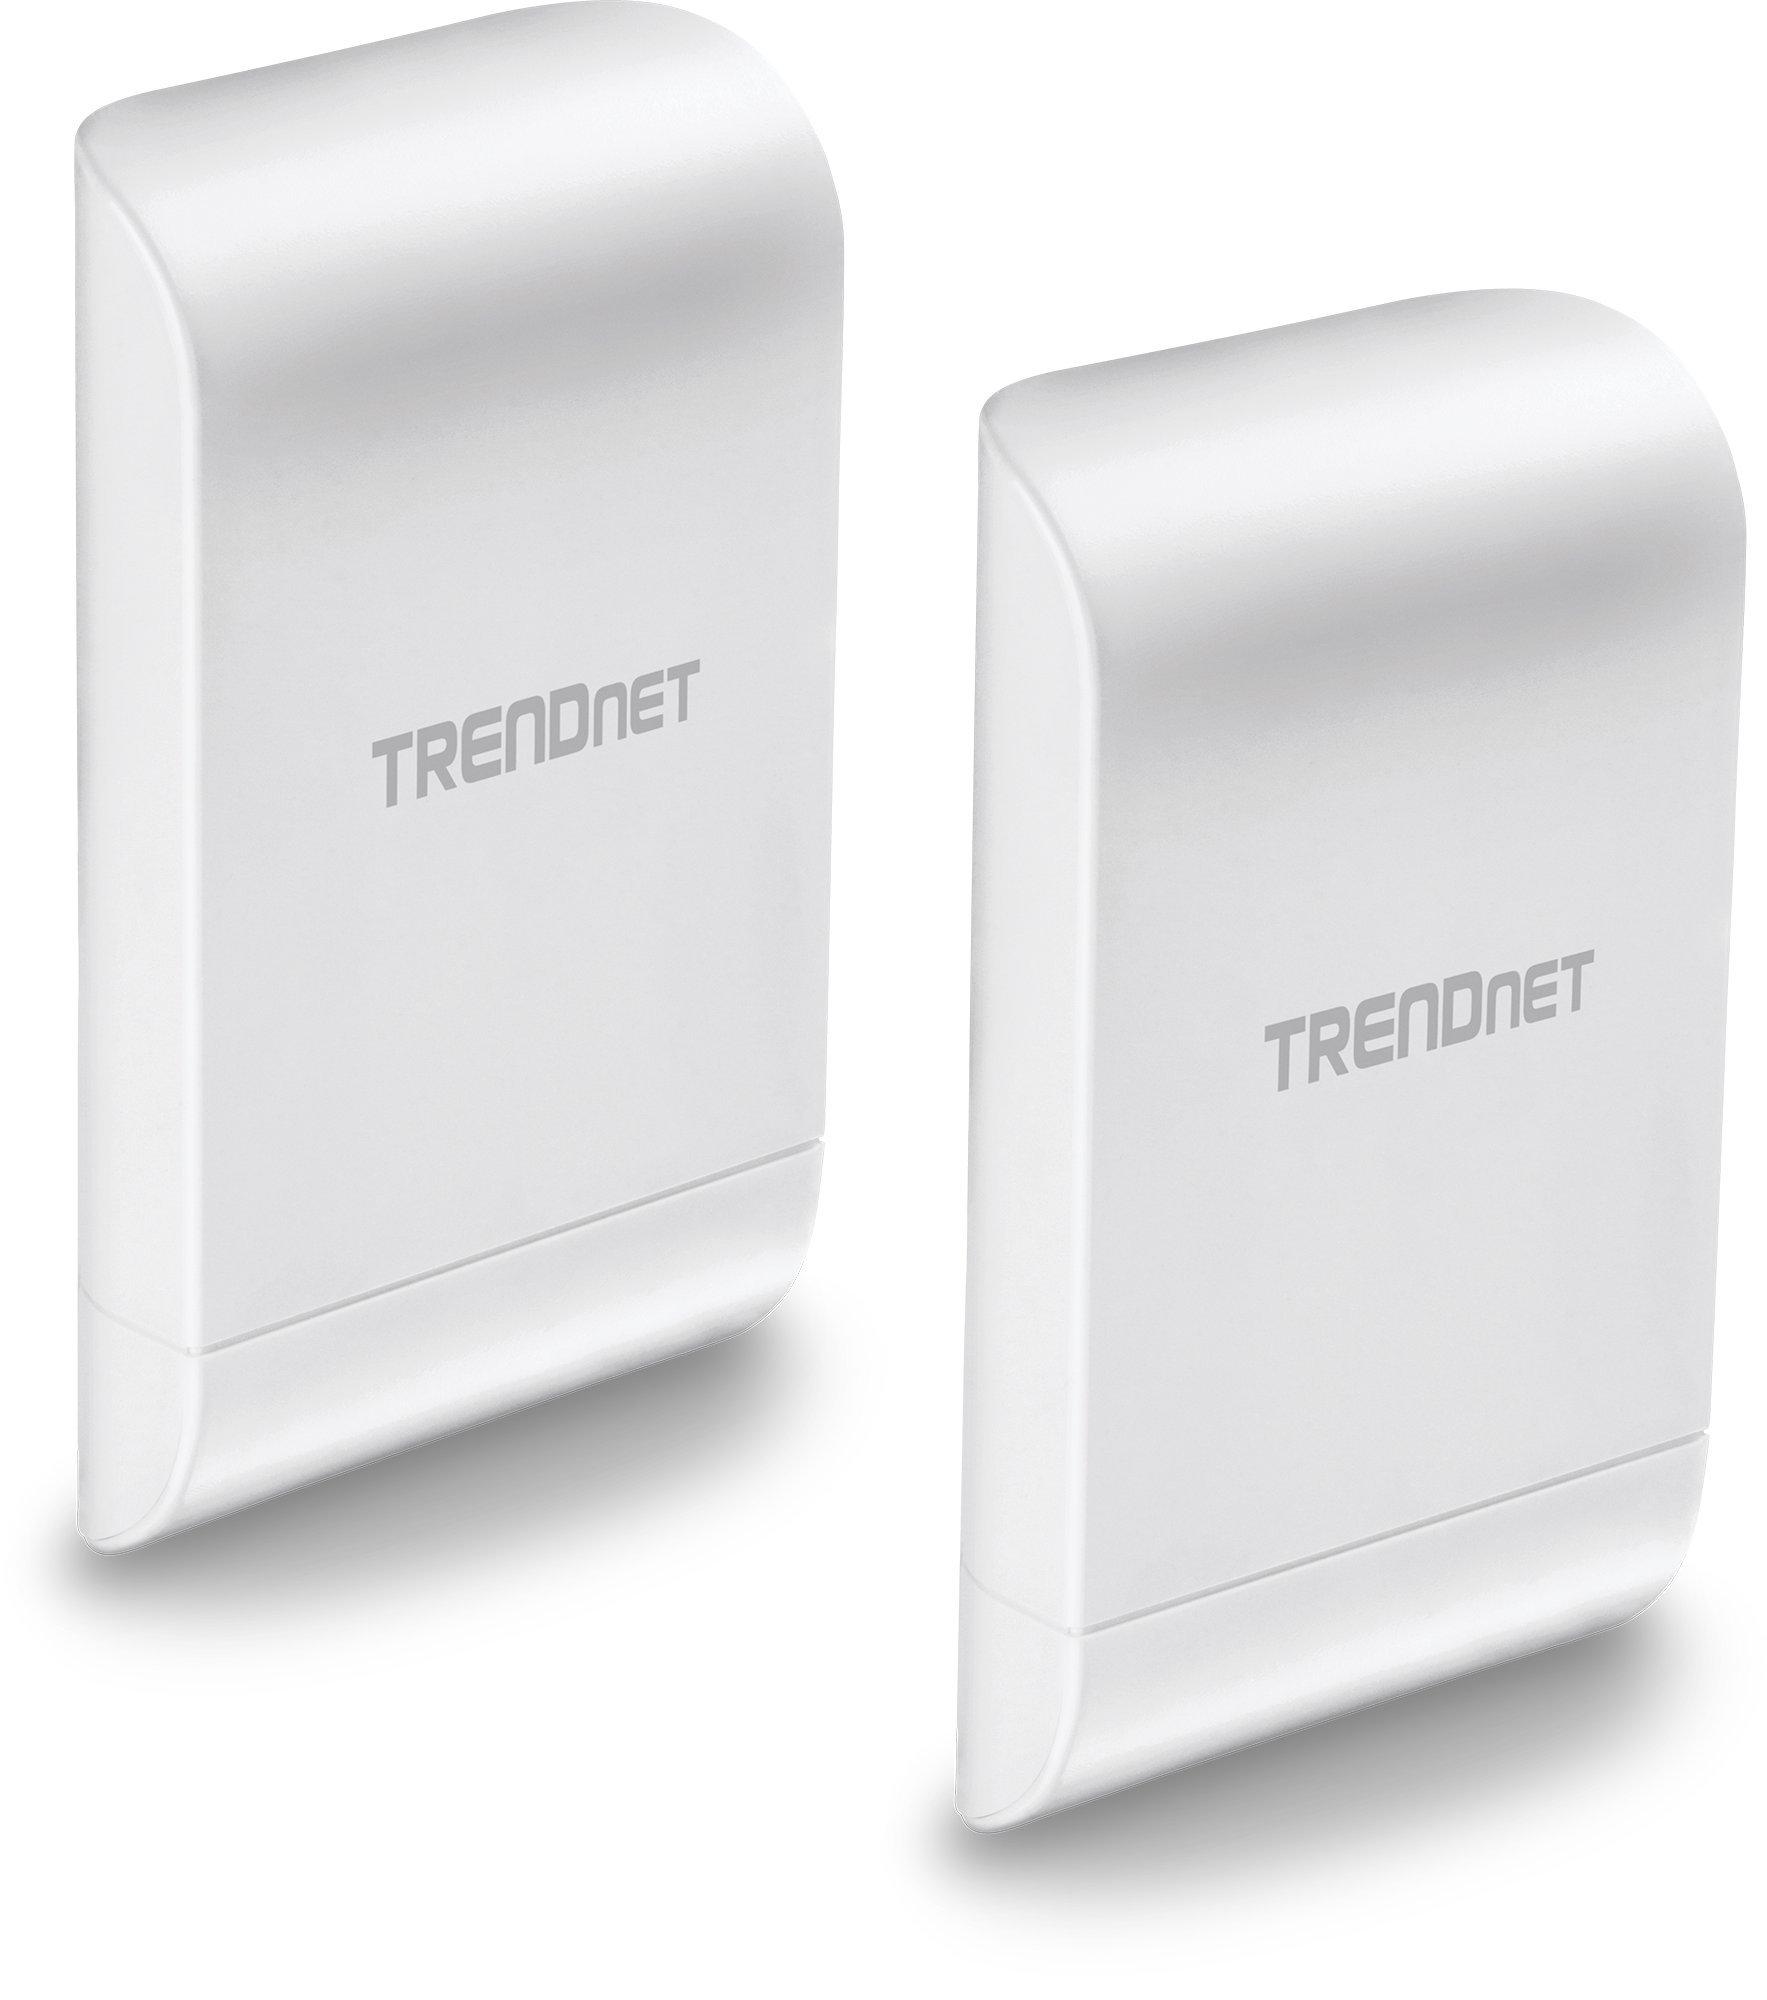 TRENDnet 10dBi Wireless N300 Outdoor PoE Preconfigured Point-to-Point Bridge Bundle Kit, 2 x Preconfigured Wireless N Access Points, IPX6 Rated Housing, TEW-740APBO2K, White